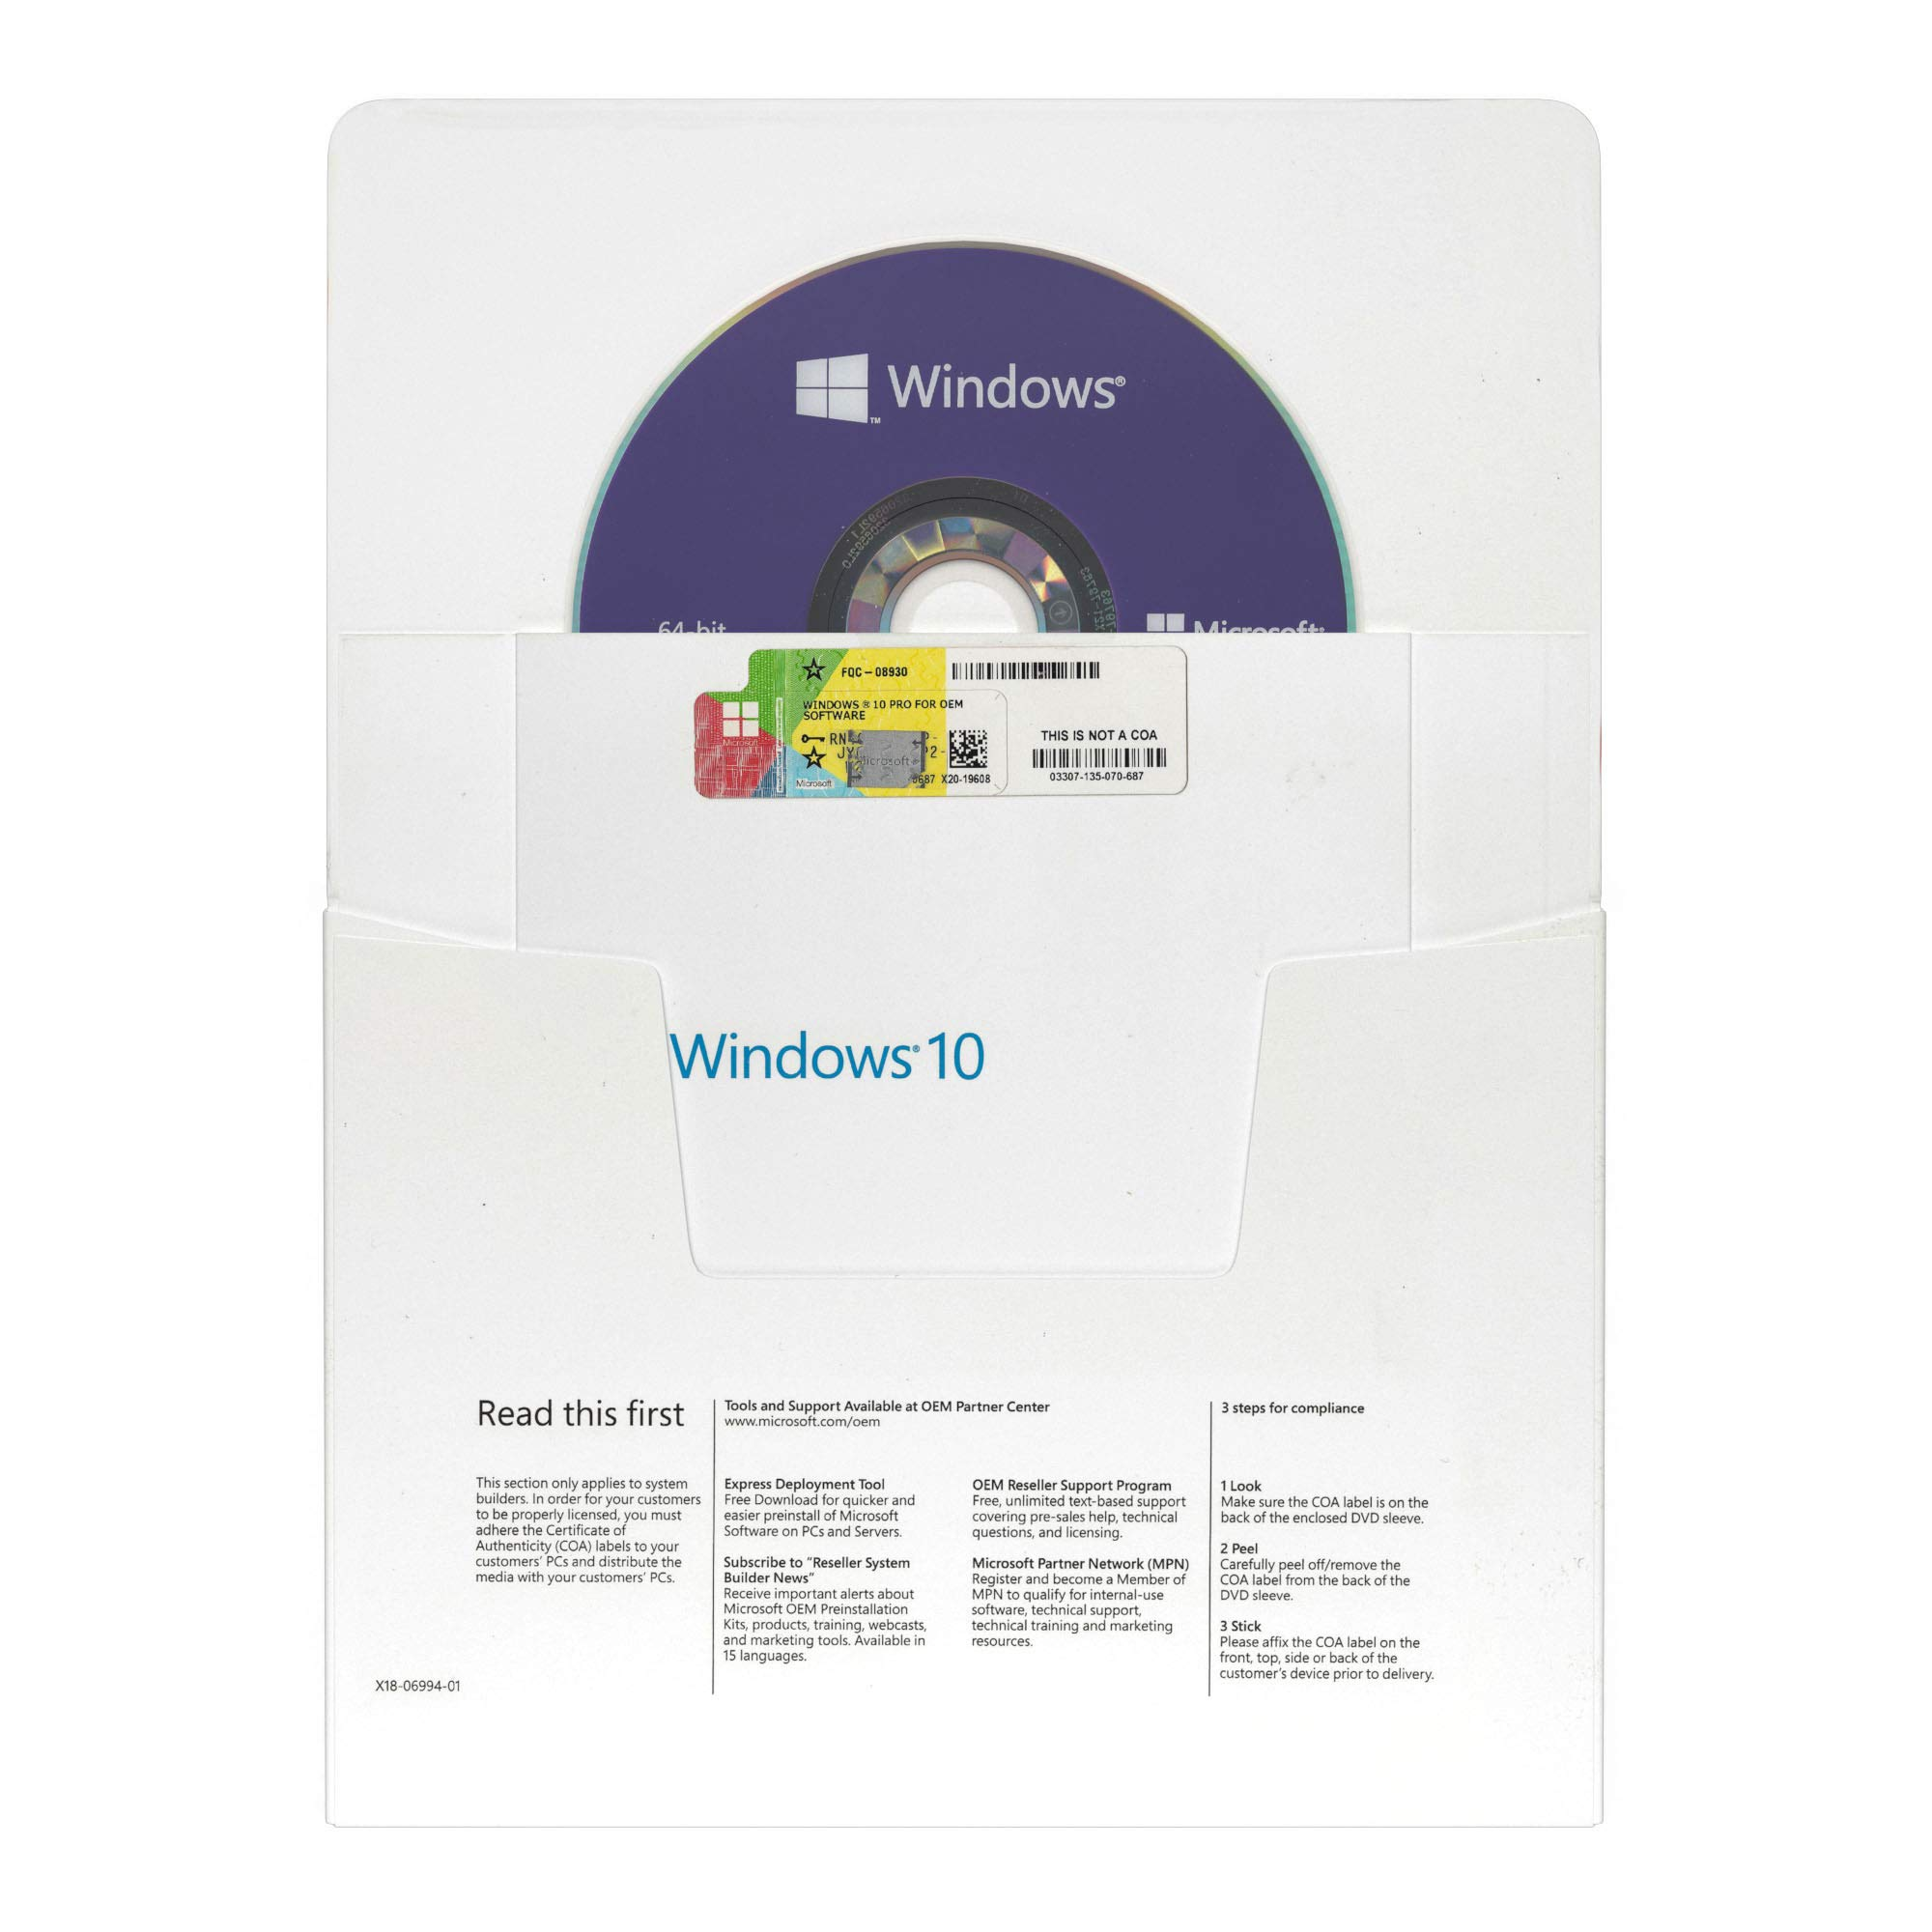 Windows 10 Pro 64 bit OEM DVD – Inglés – Versión Completa – OEM Windows 10 Professional 64 bit: Amazon.es: Electrónica